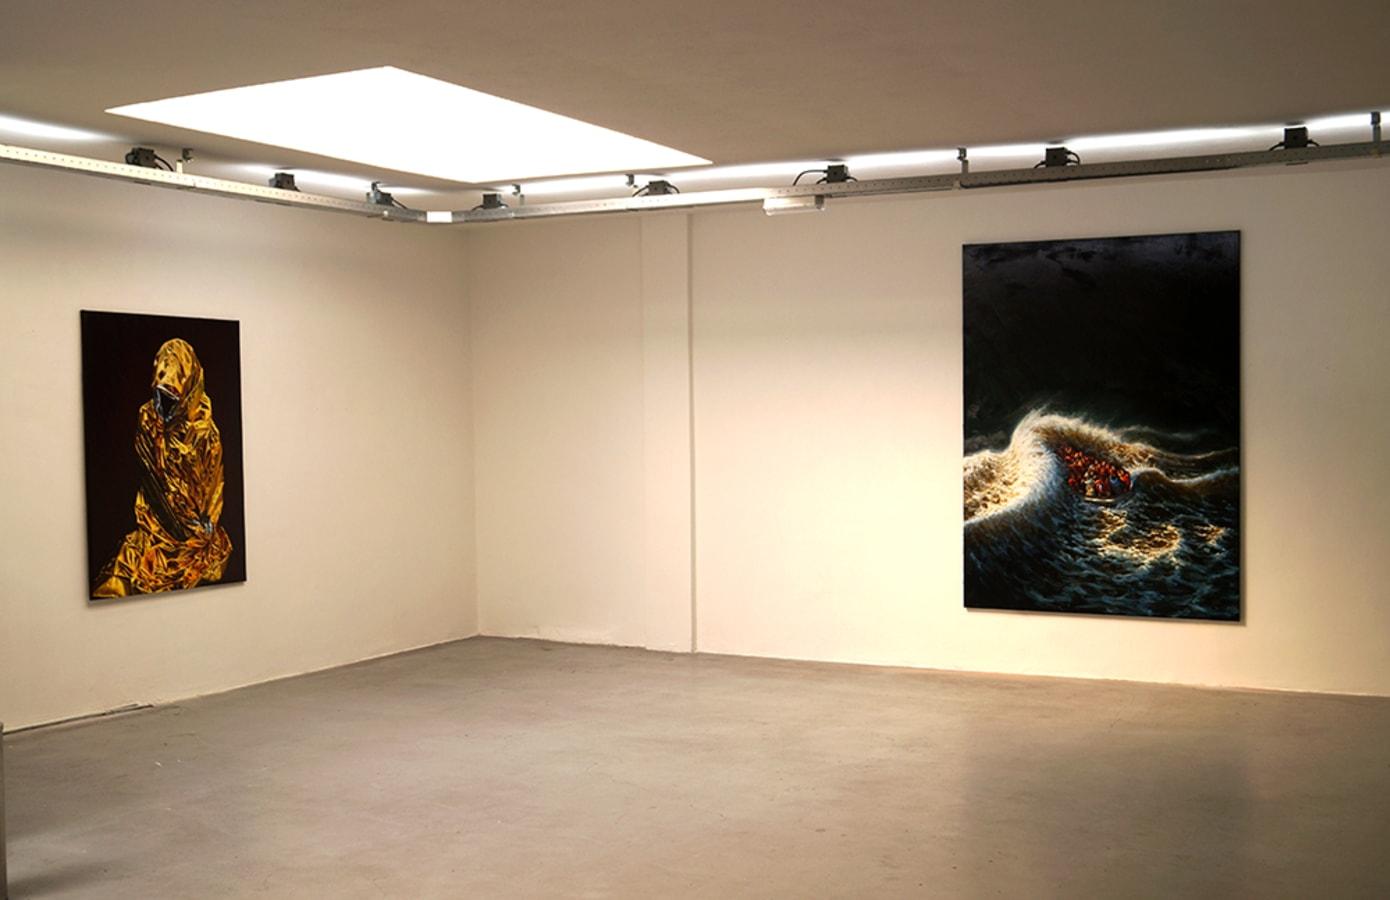 GELUKSZOEKERS / FORTUNE SEEKERS, Pascal Bastiaenen,